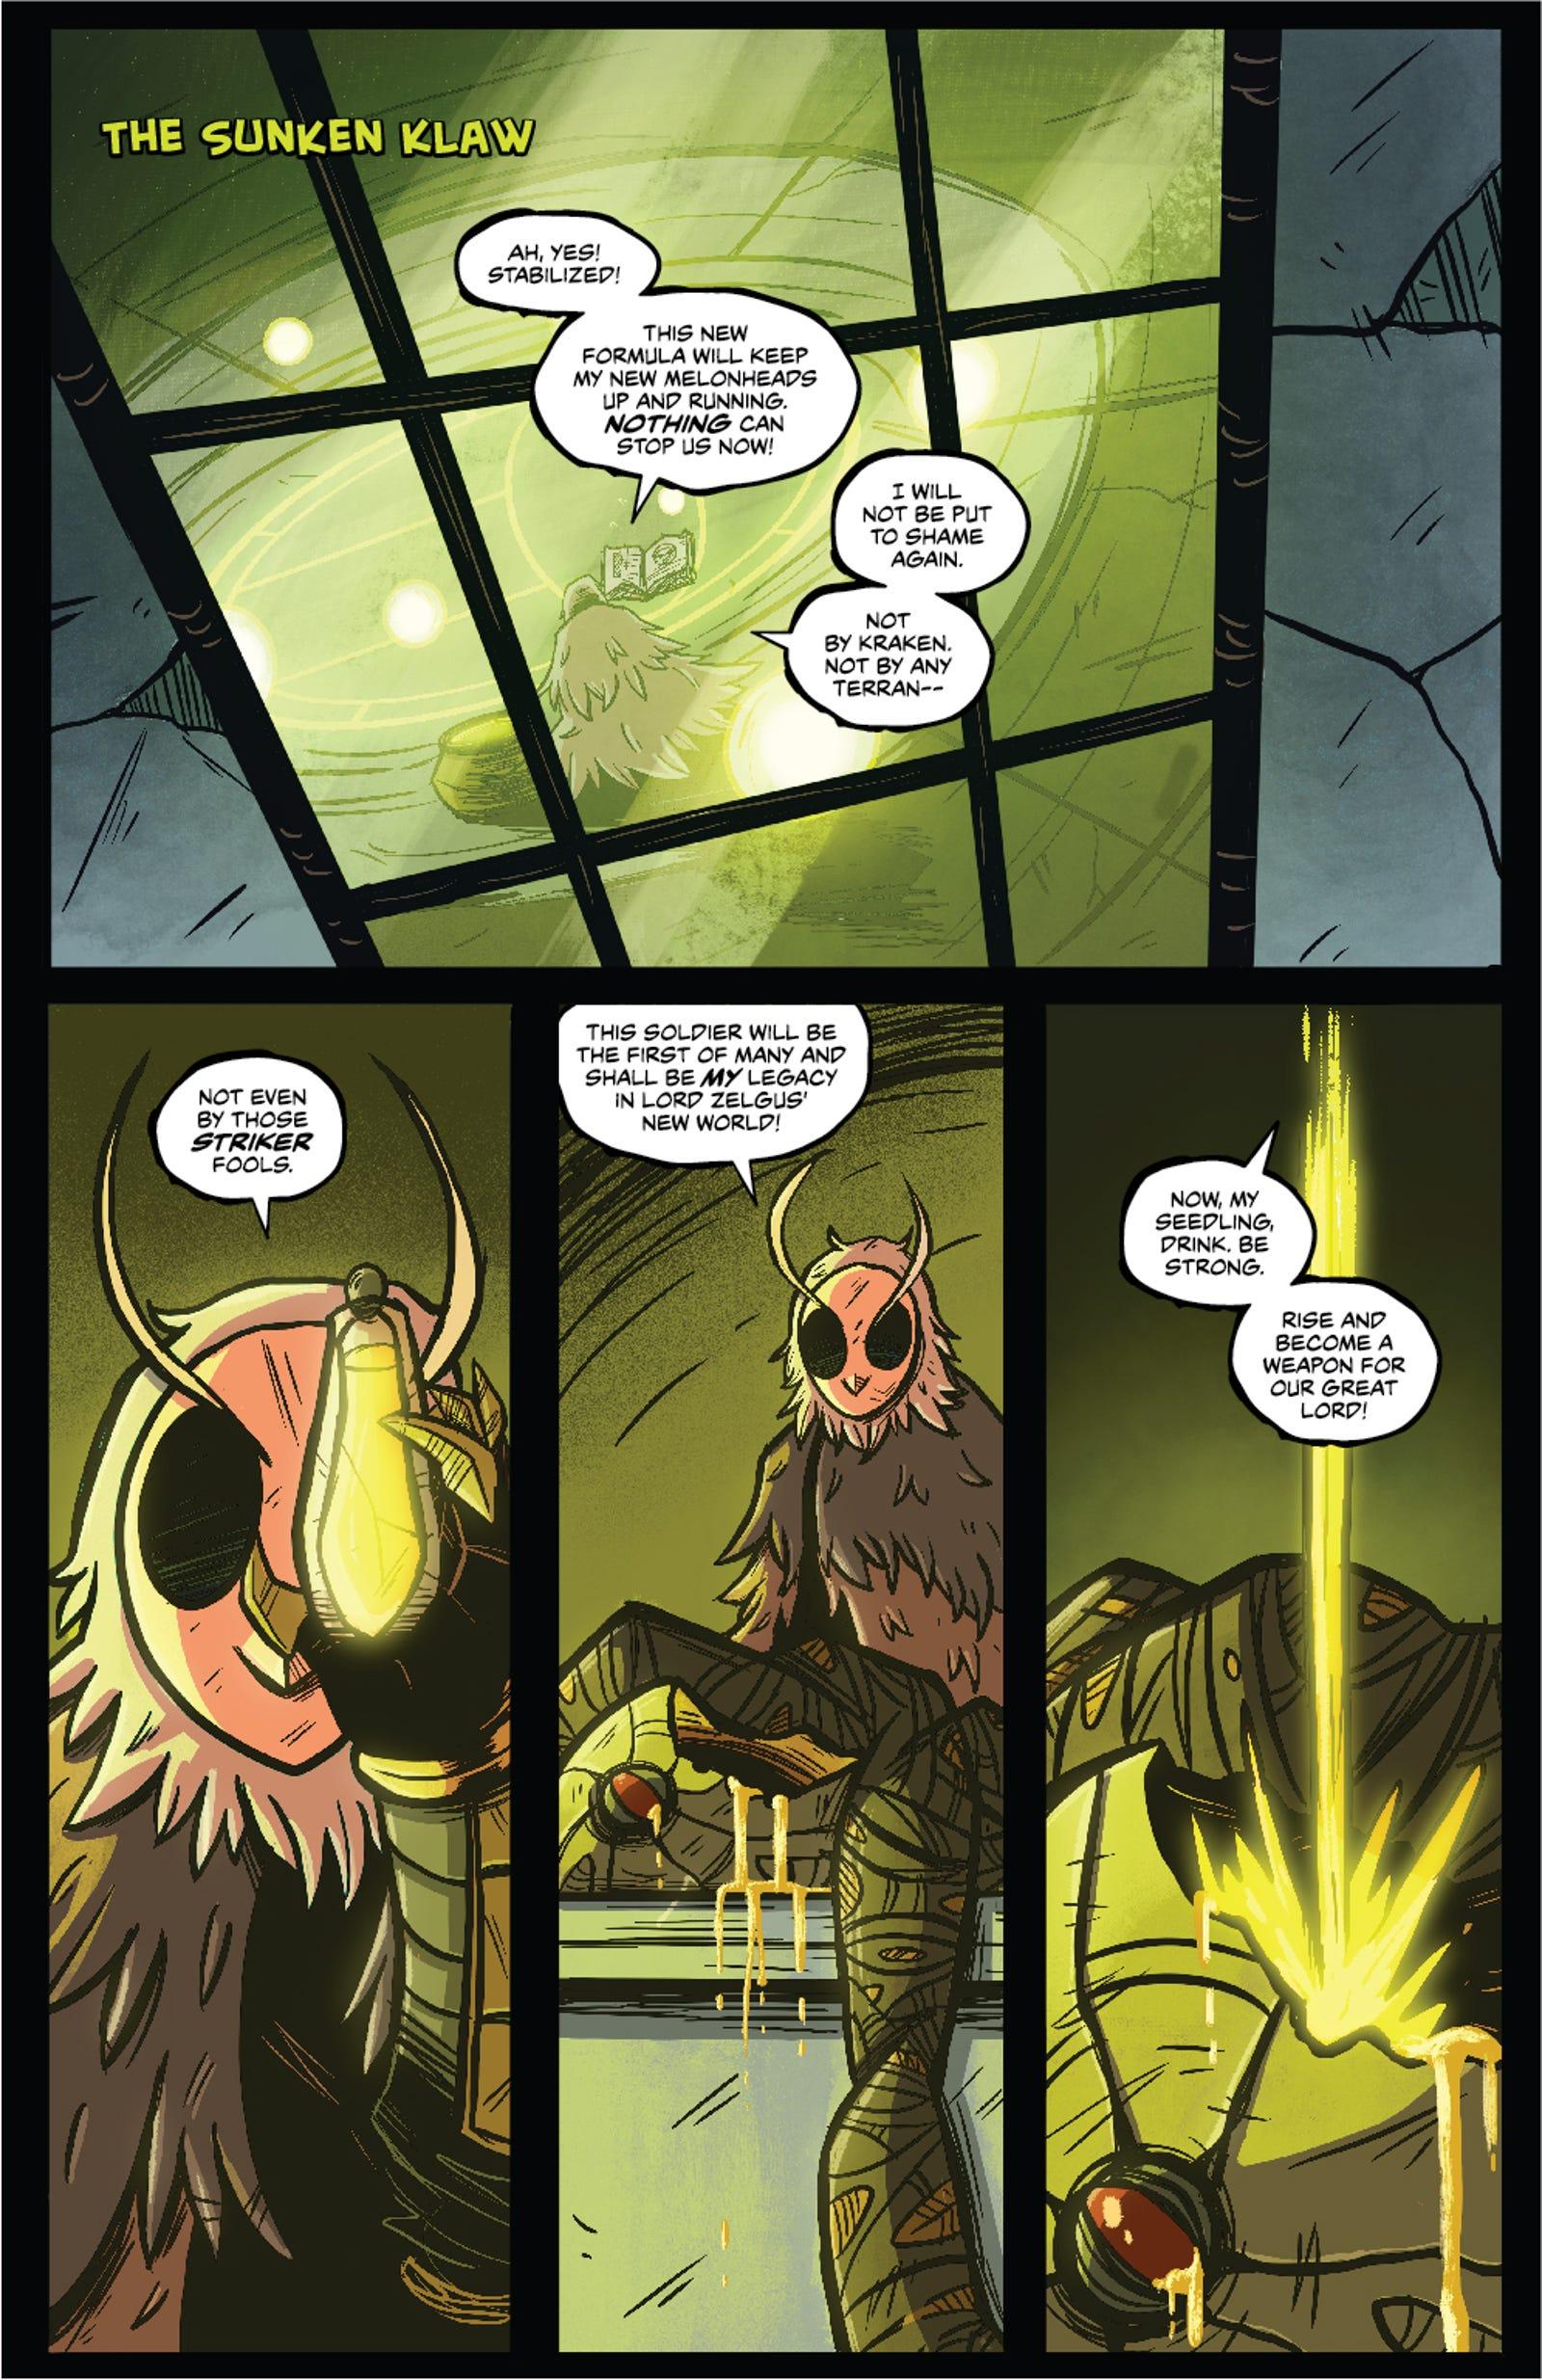 Get a look inside Beast Heart Strikers #2!